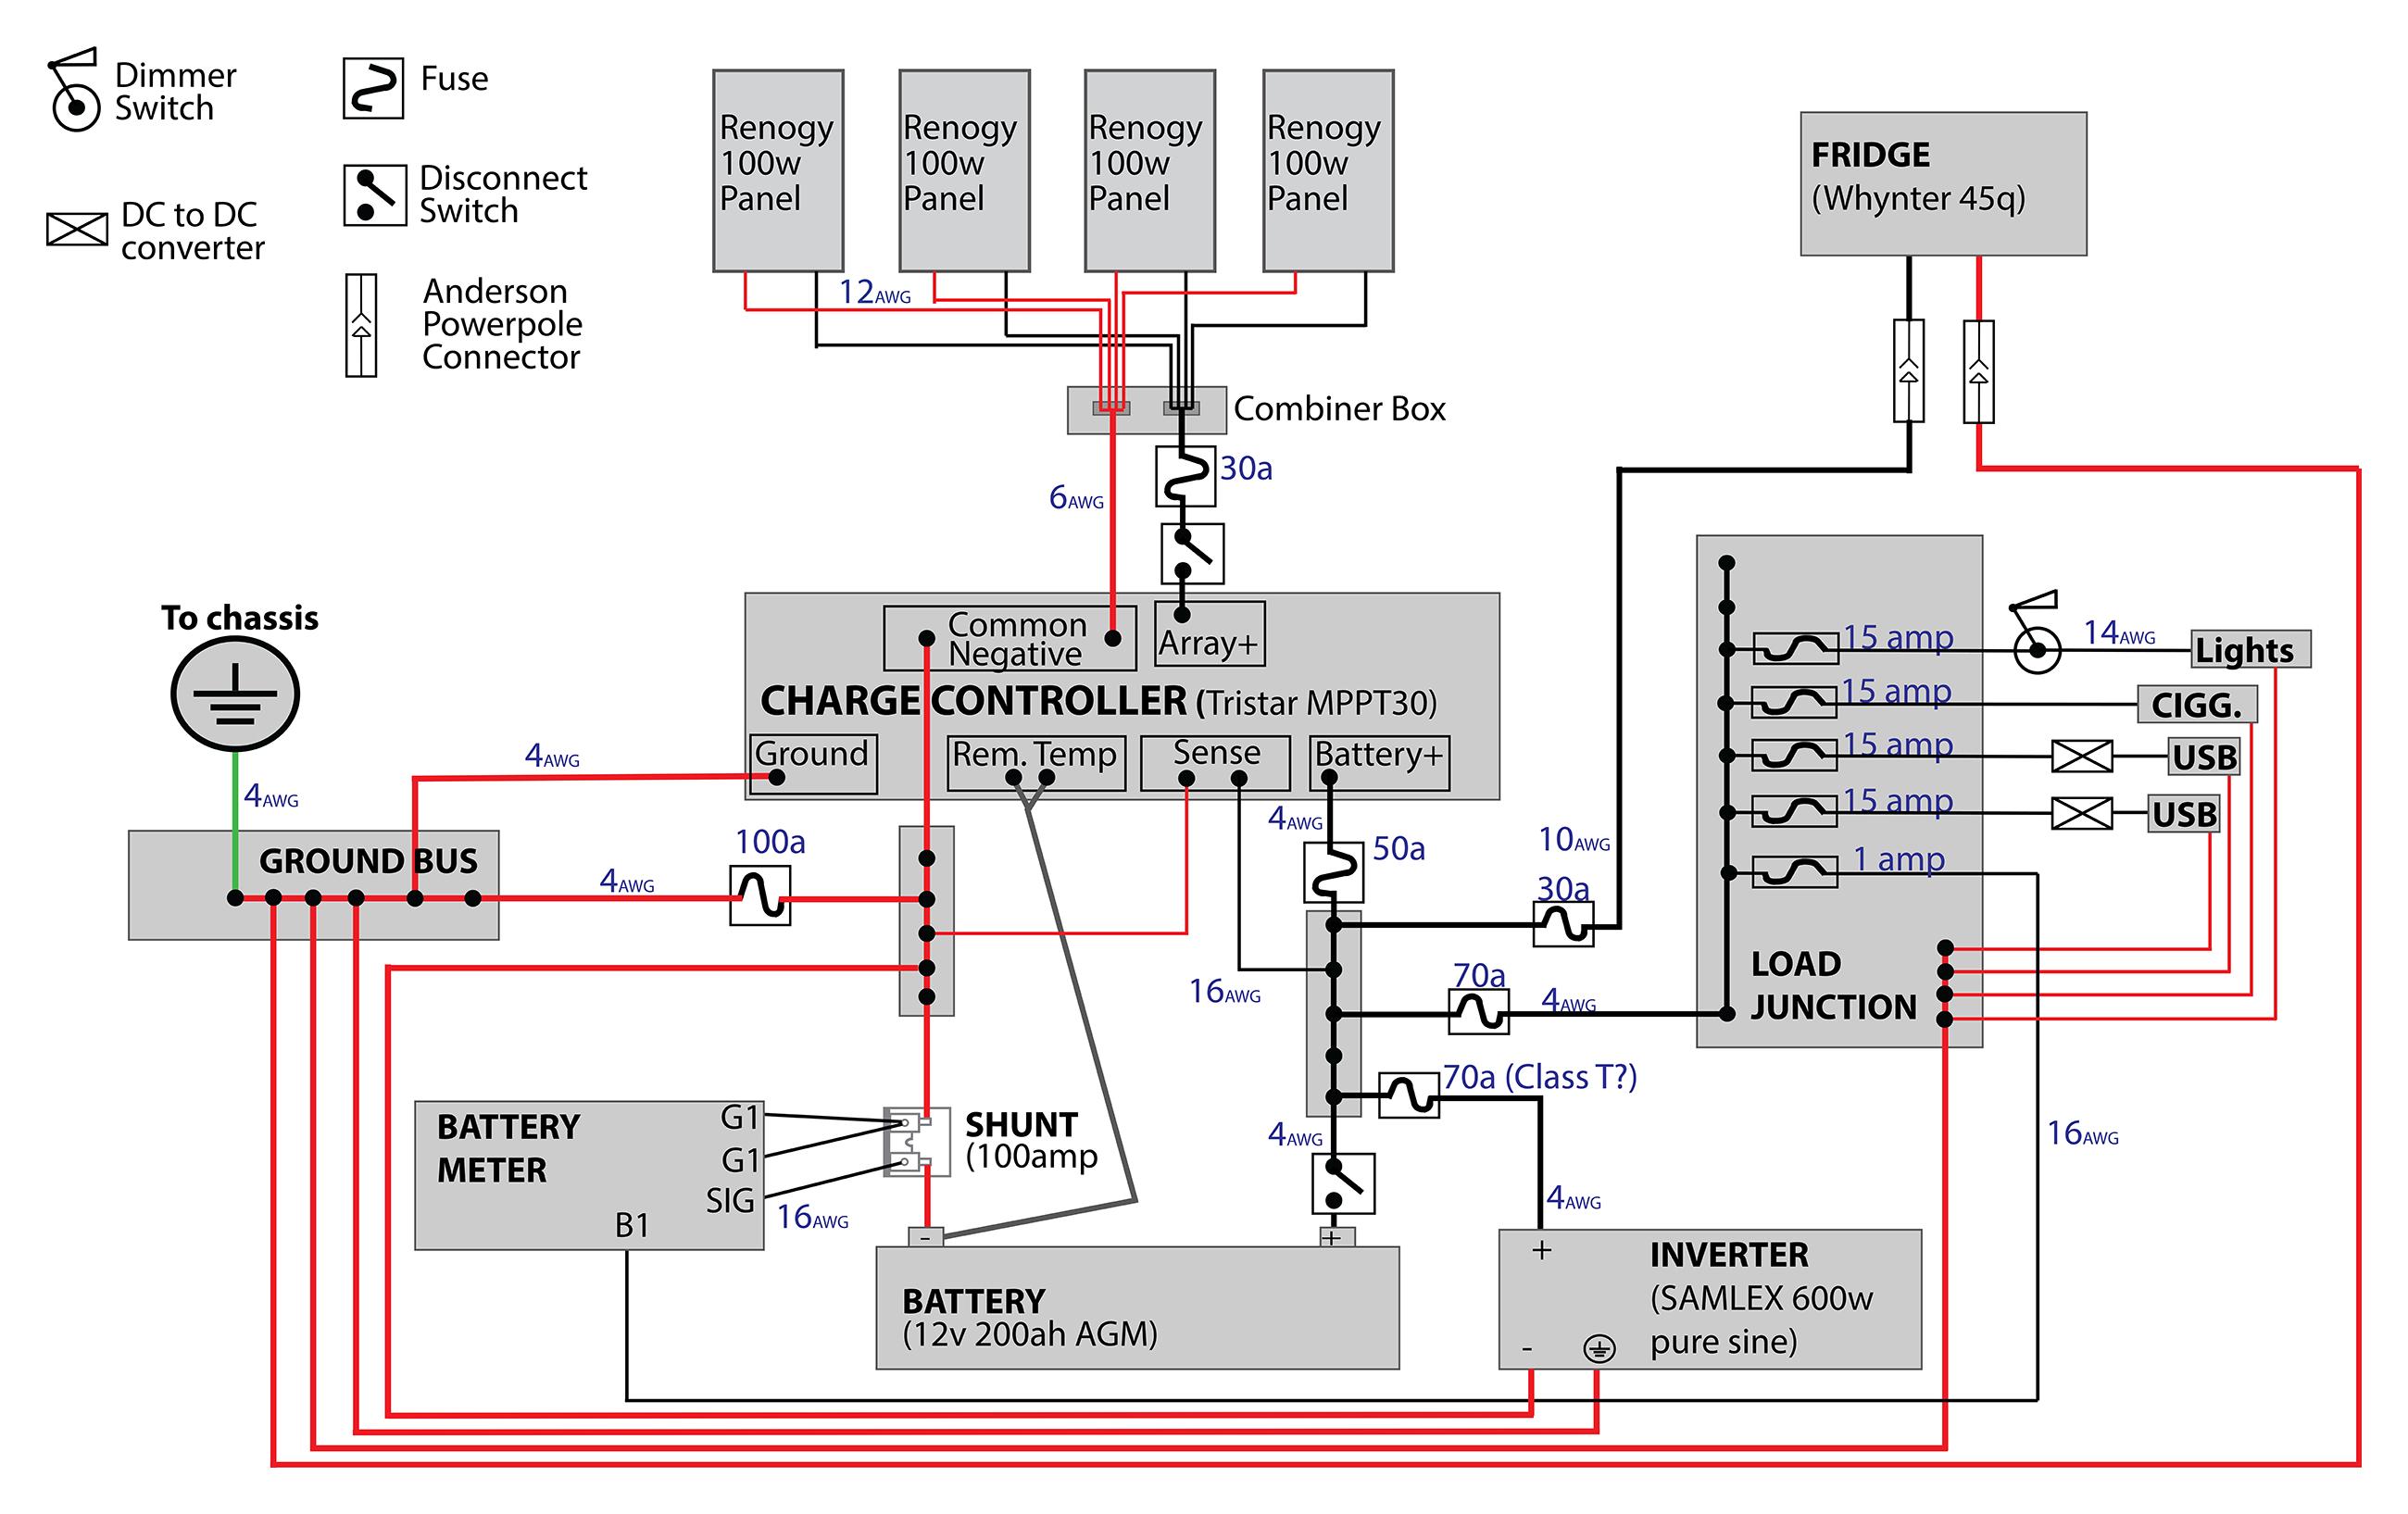 12 Volt 400 Watt Solar Wiring Diagrams | Wiring Diagram - Renogy Wiring Diagram